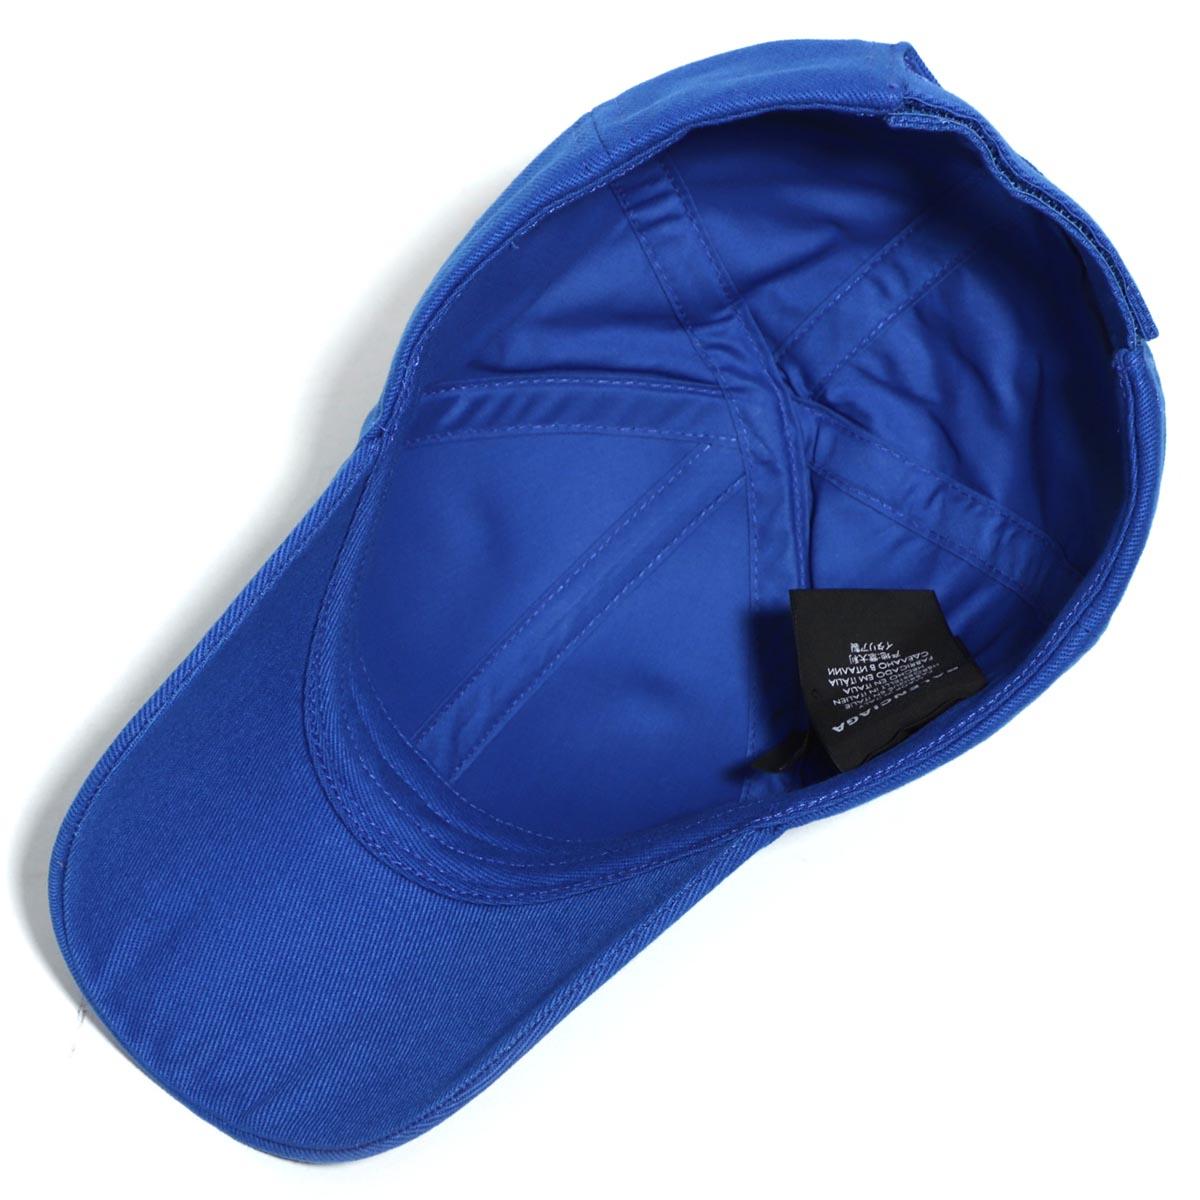 BALENCIAGA バレンシアガ ベースボールキャップ/帽子/HAT BB VISOR CAP メンズ